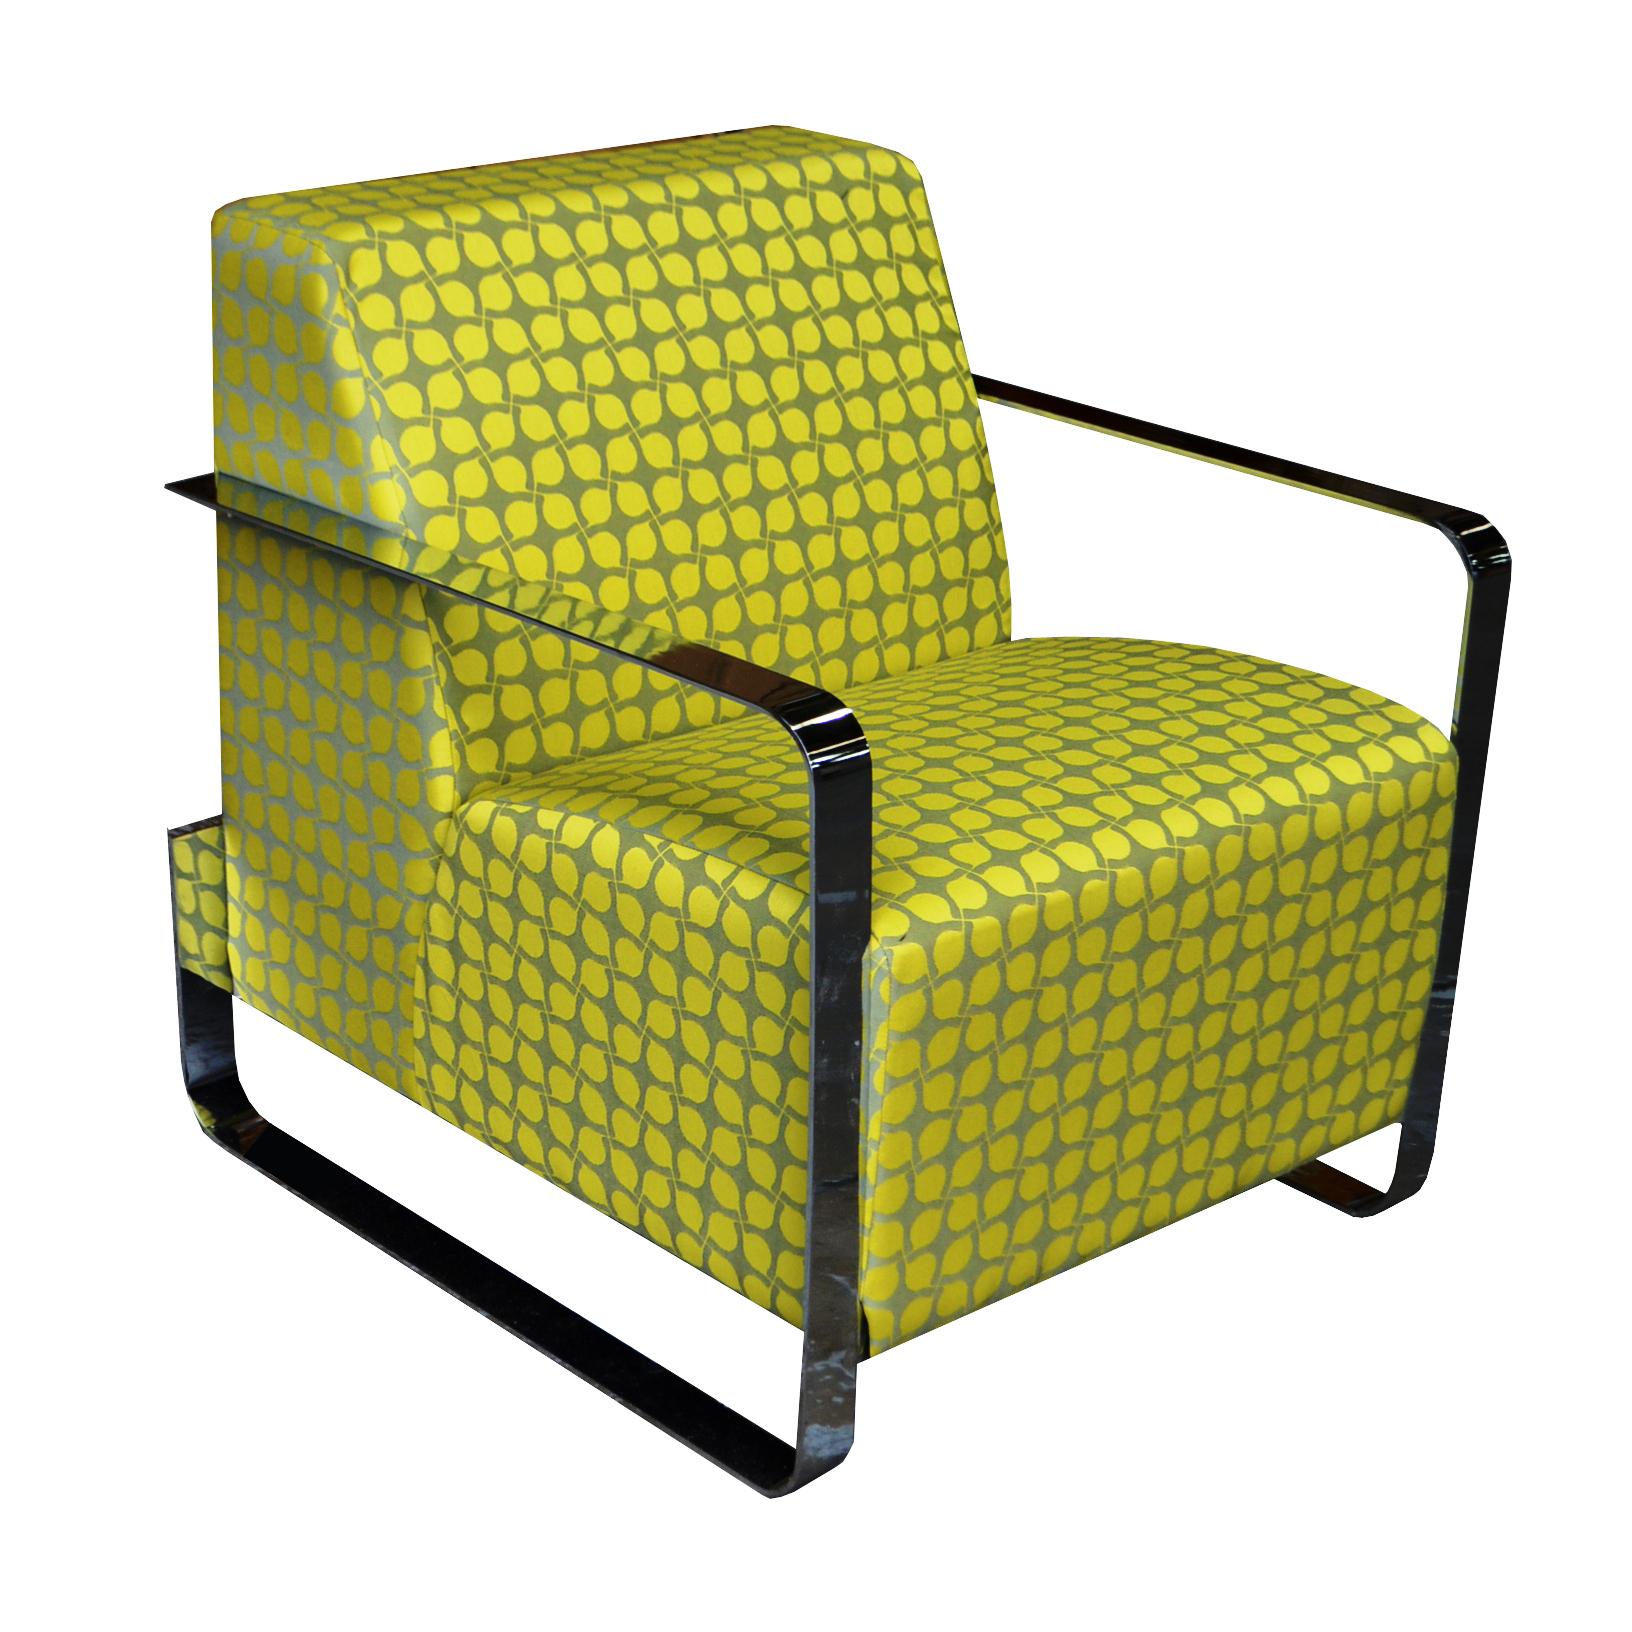 Direct Ergonomics | Sydney Office Furniture | Ergonomic Furniture | Collaborative Seating | Waiting Lounges | Waiting Room Seating | Ergonomic Seating | Rumi Flo